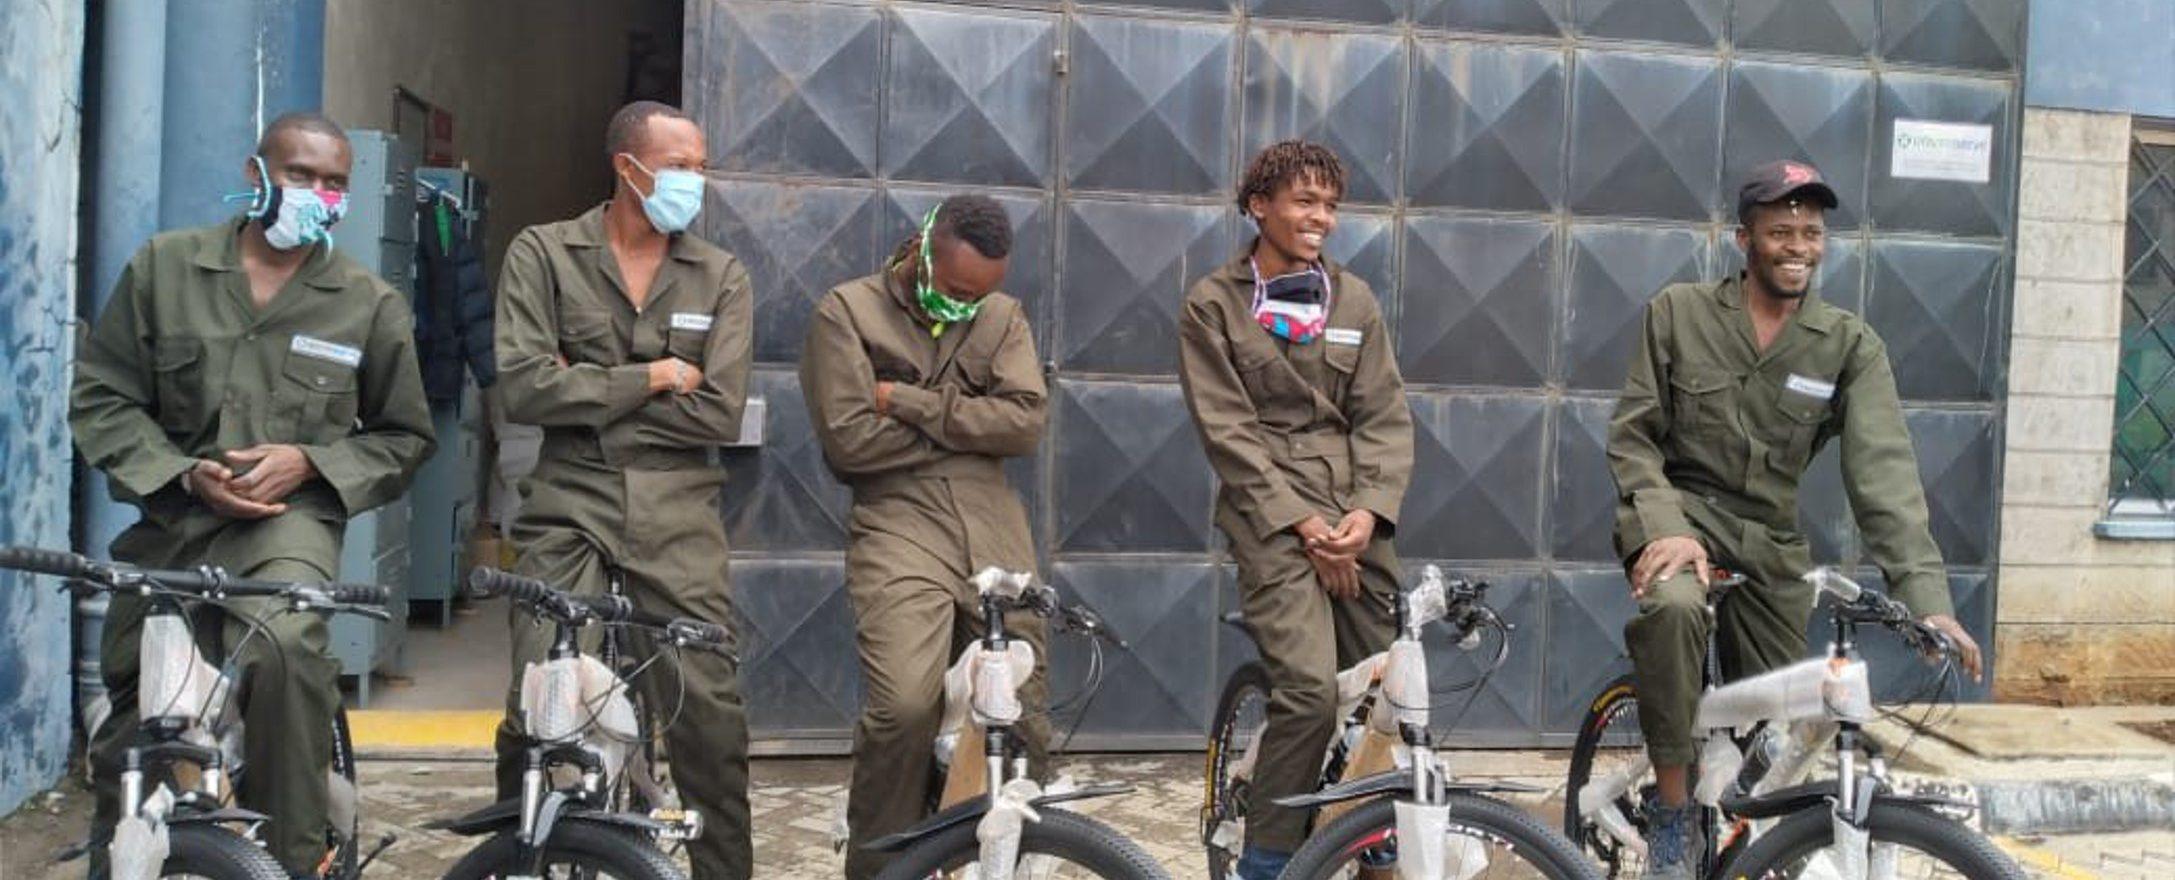 Enviroserve Kenya warehouse team with their new bikes